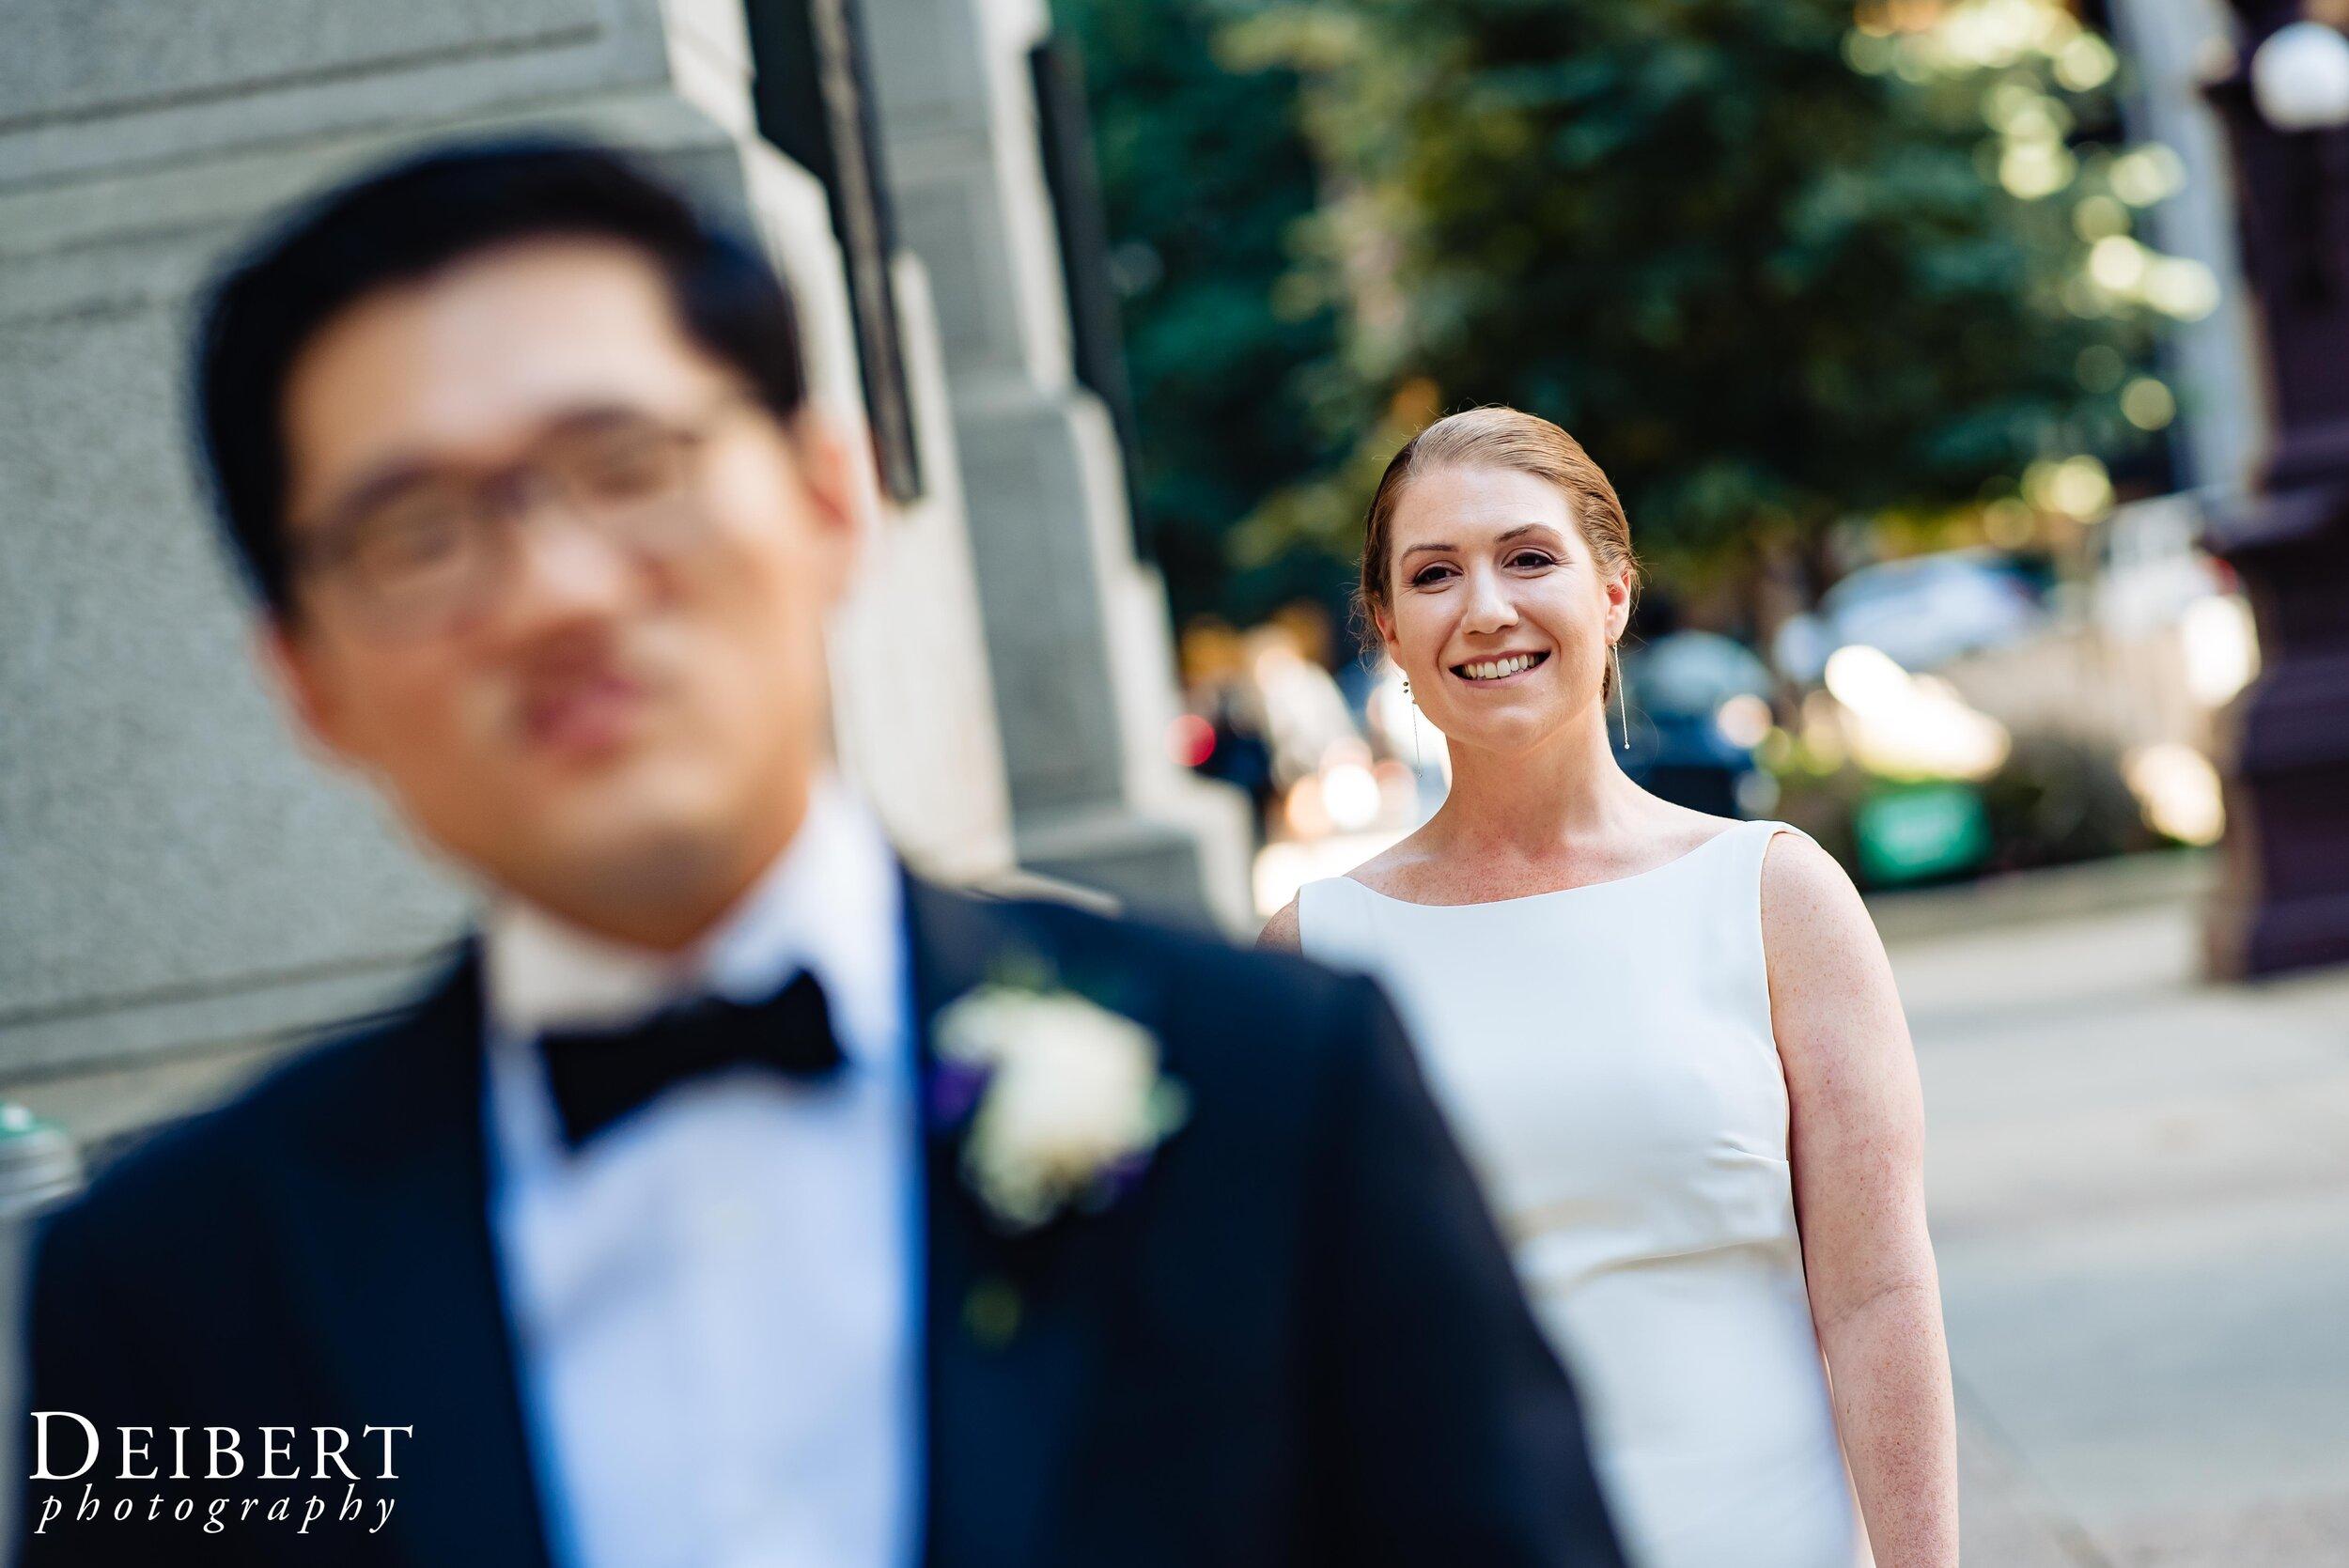 Franklin Institute Philadelpia Wedding-025.JPG